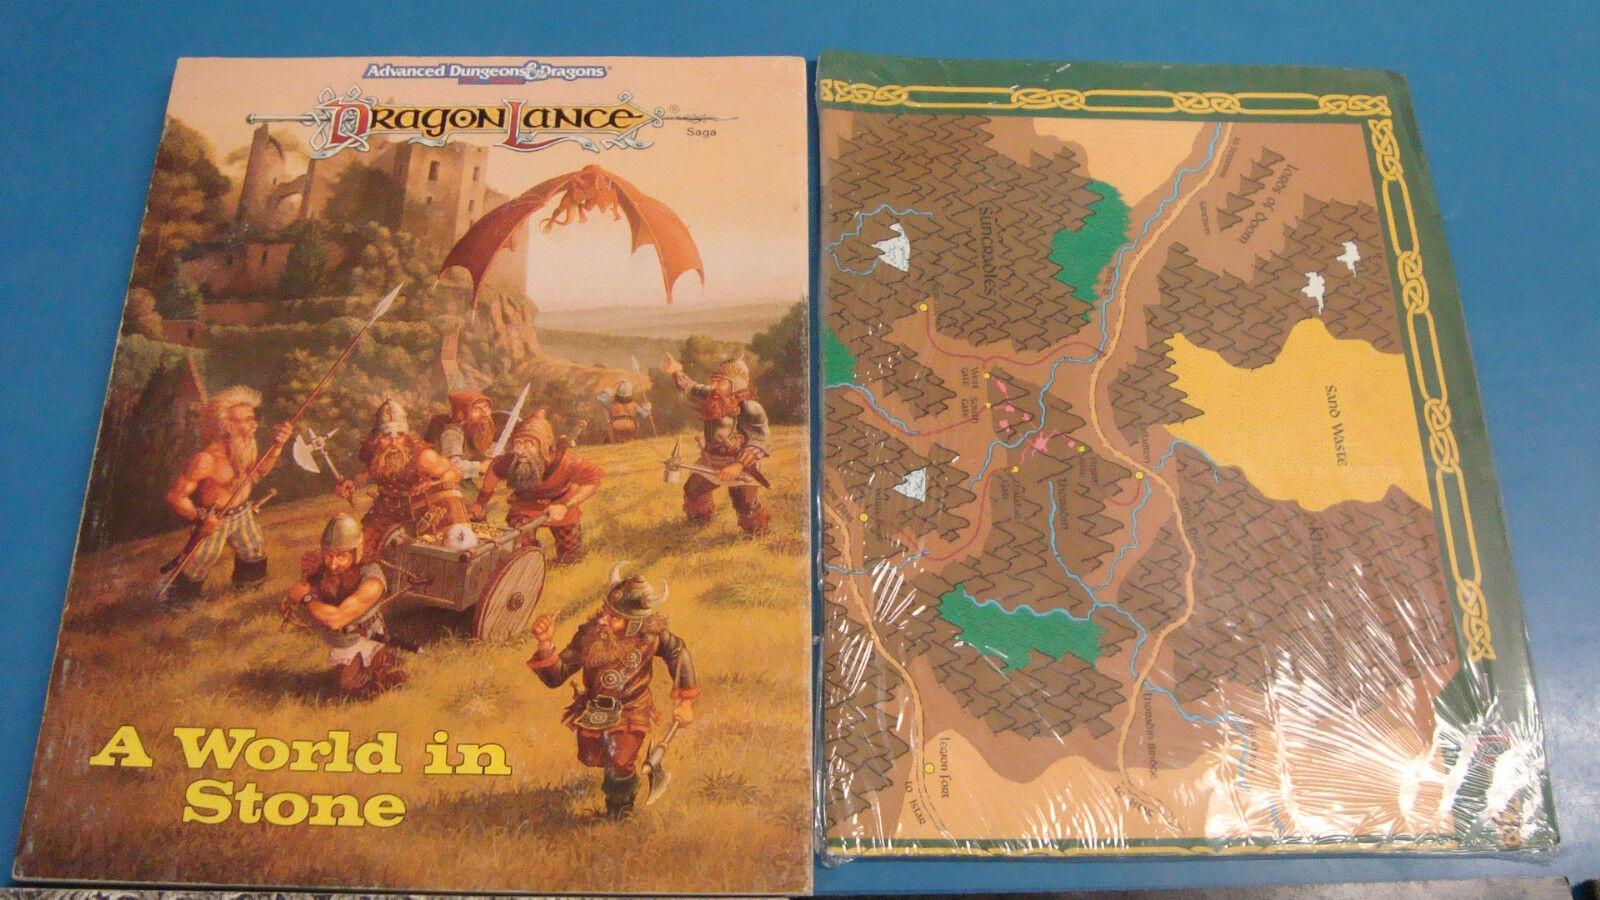 9x Used AD&D items Dragonlance, Forgotten Realms, Greyhawk, Dwarves, Map etc